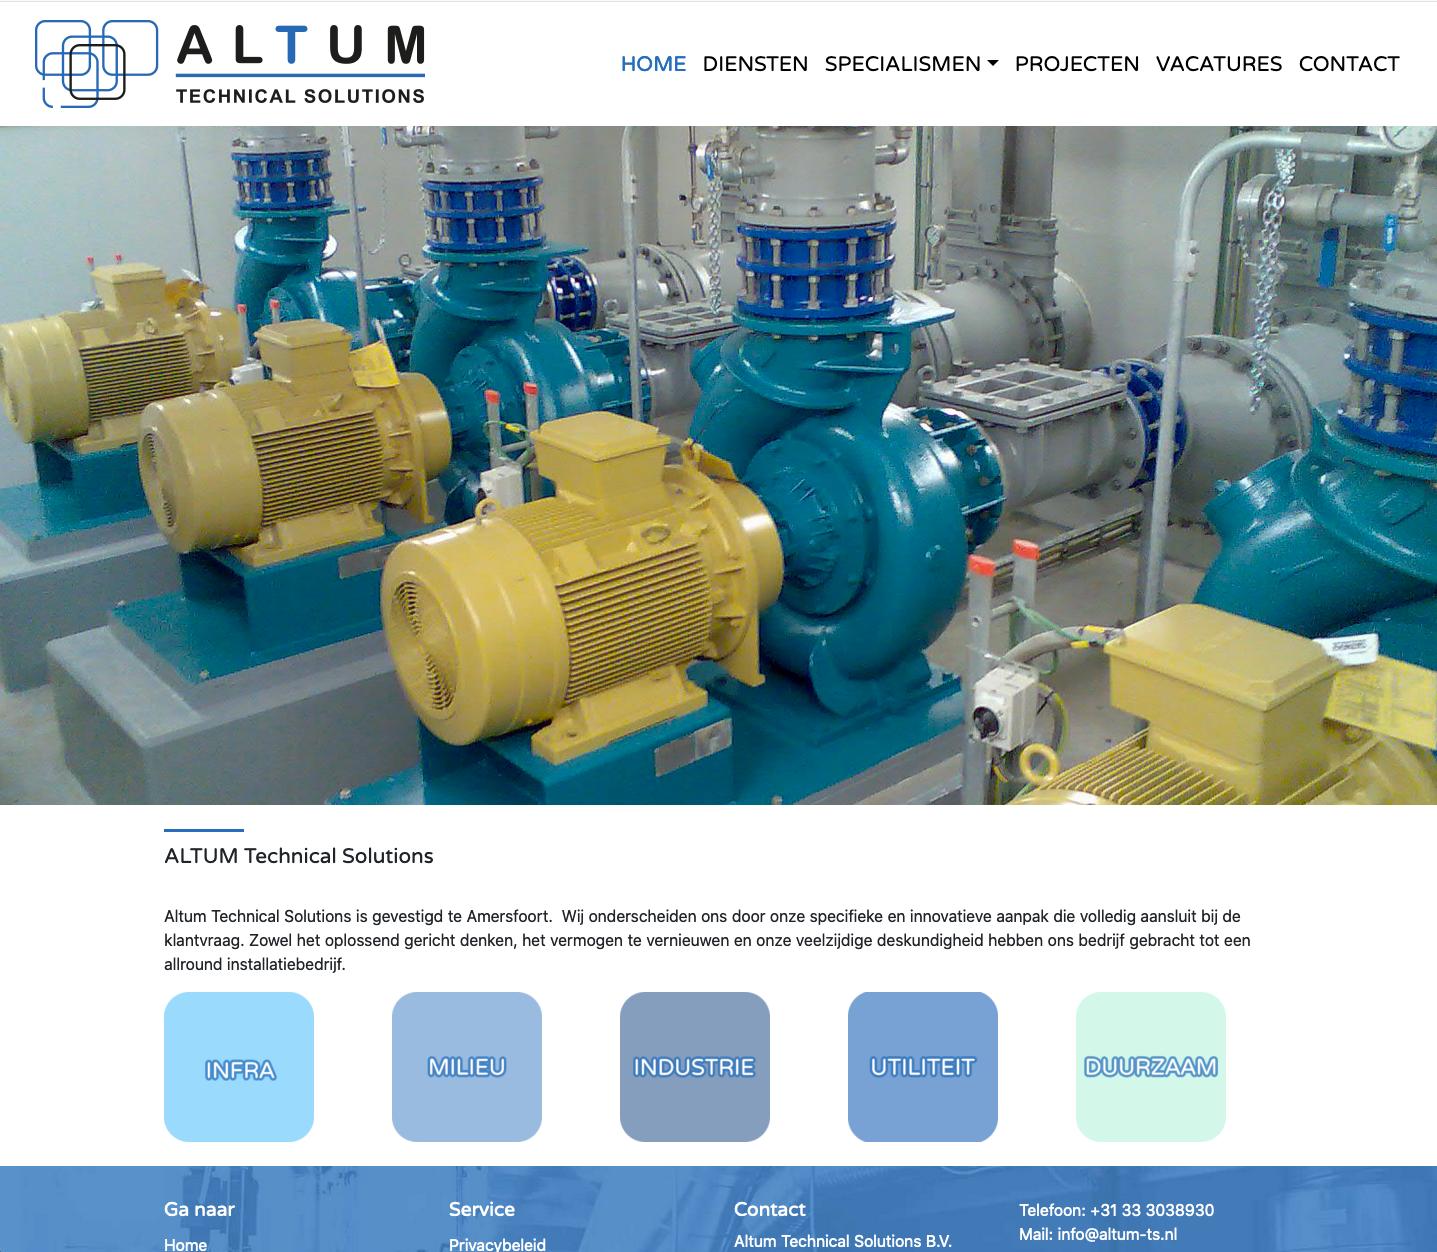 ALTUM Technical Solutions